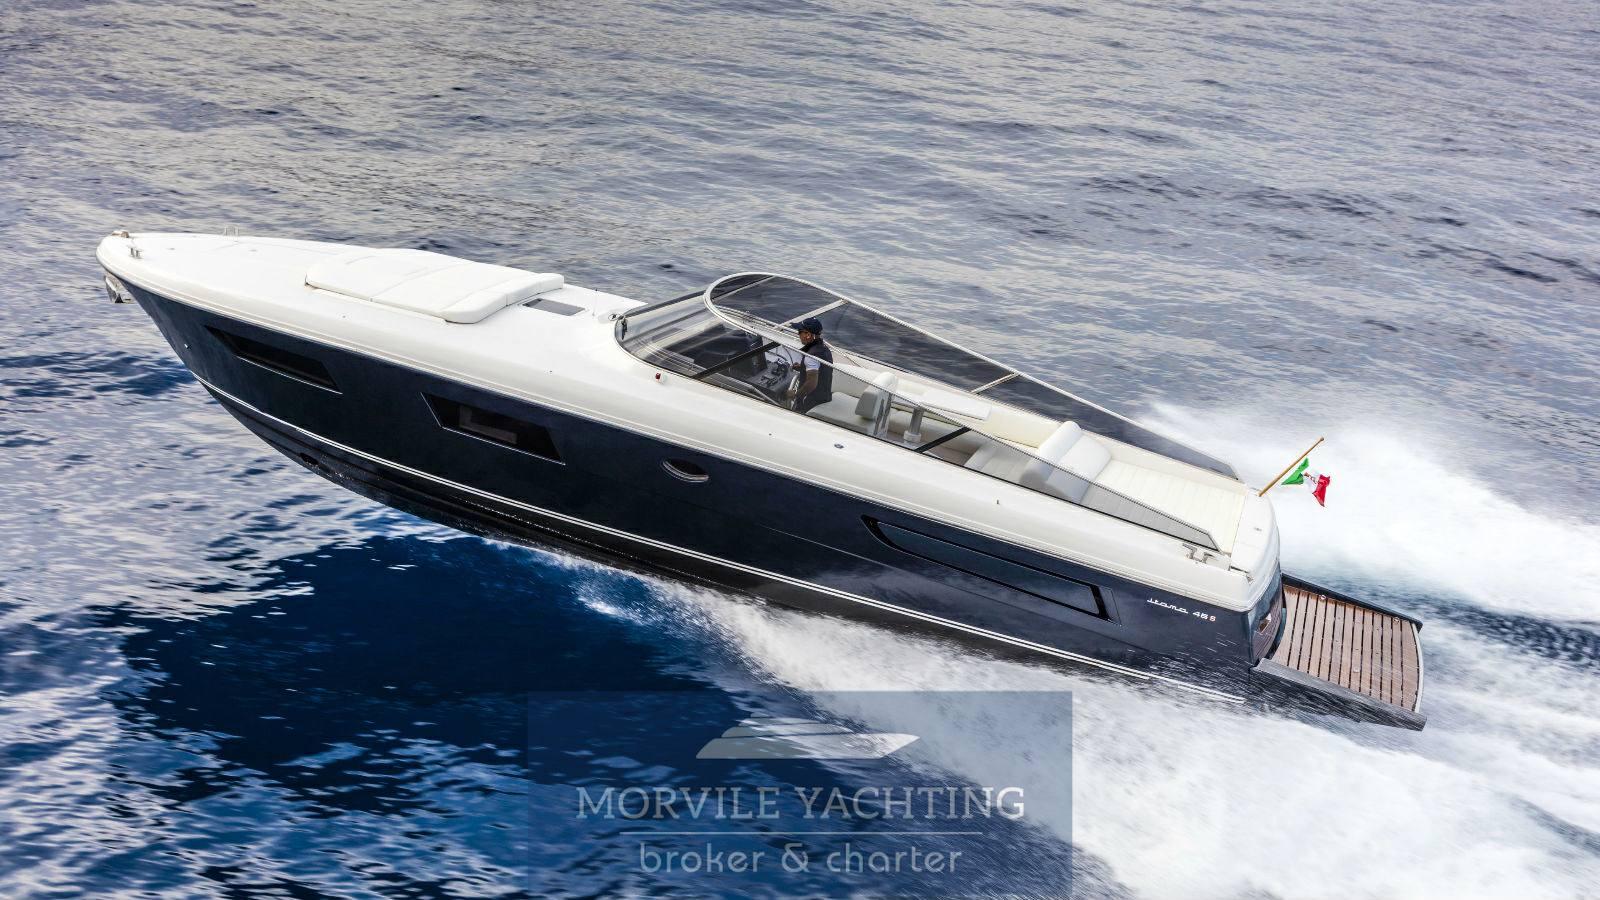 ITAMA 45 Barca a motore usata in vendita